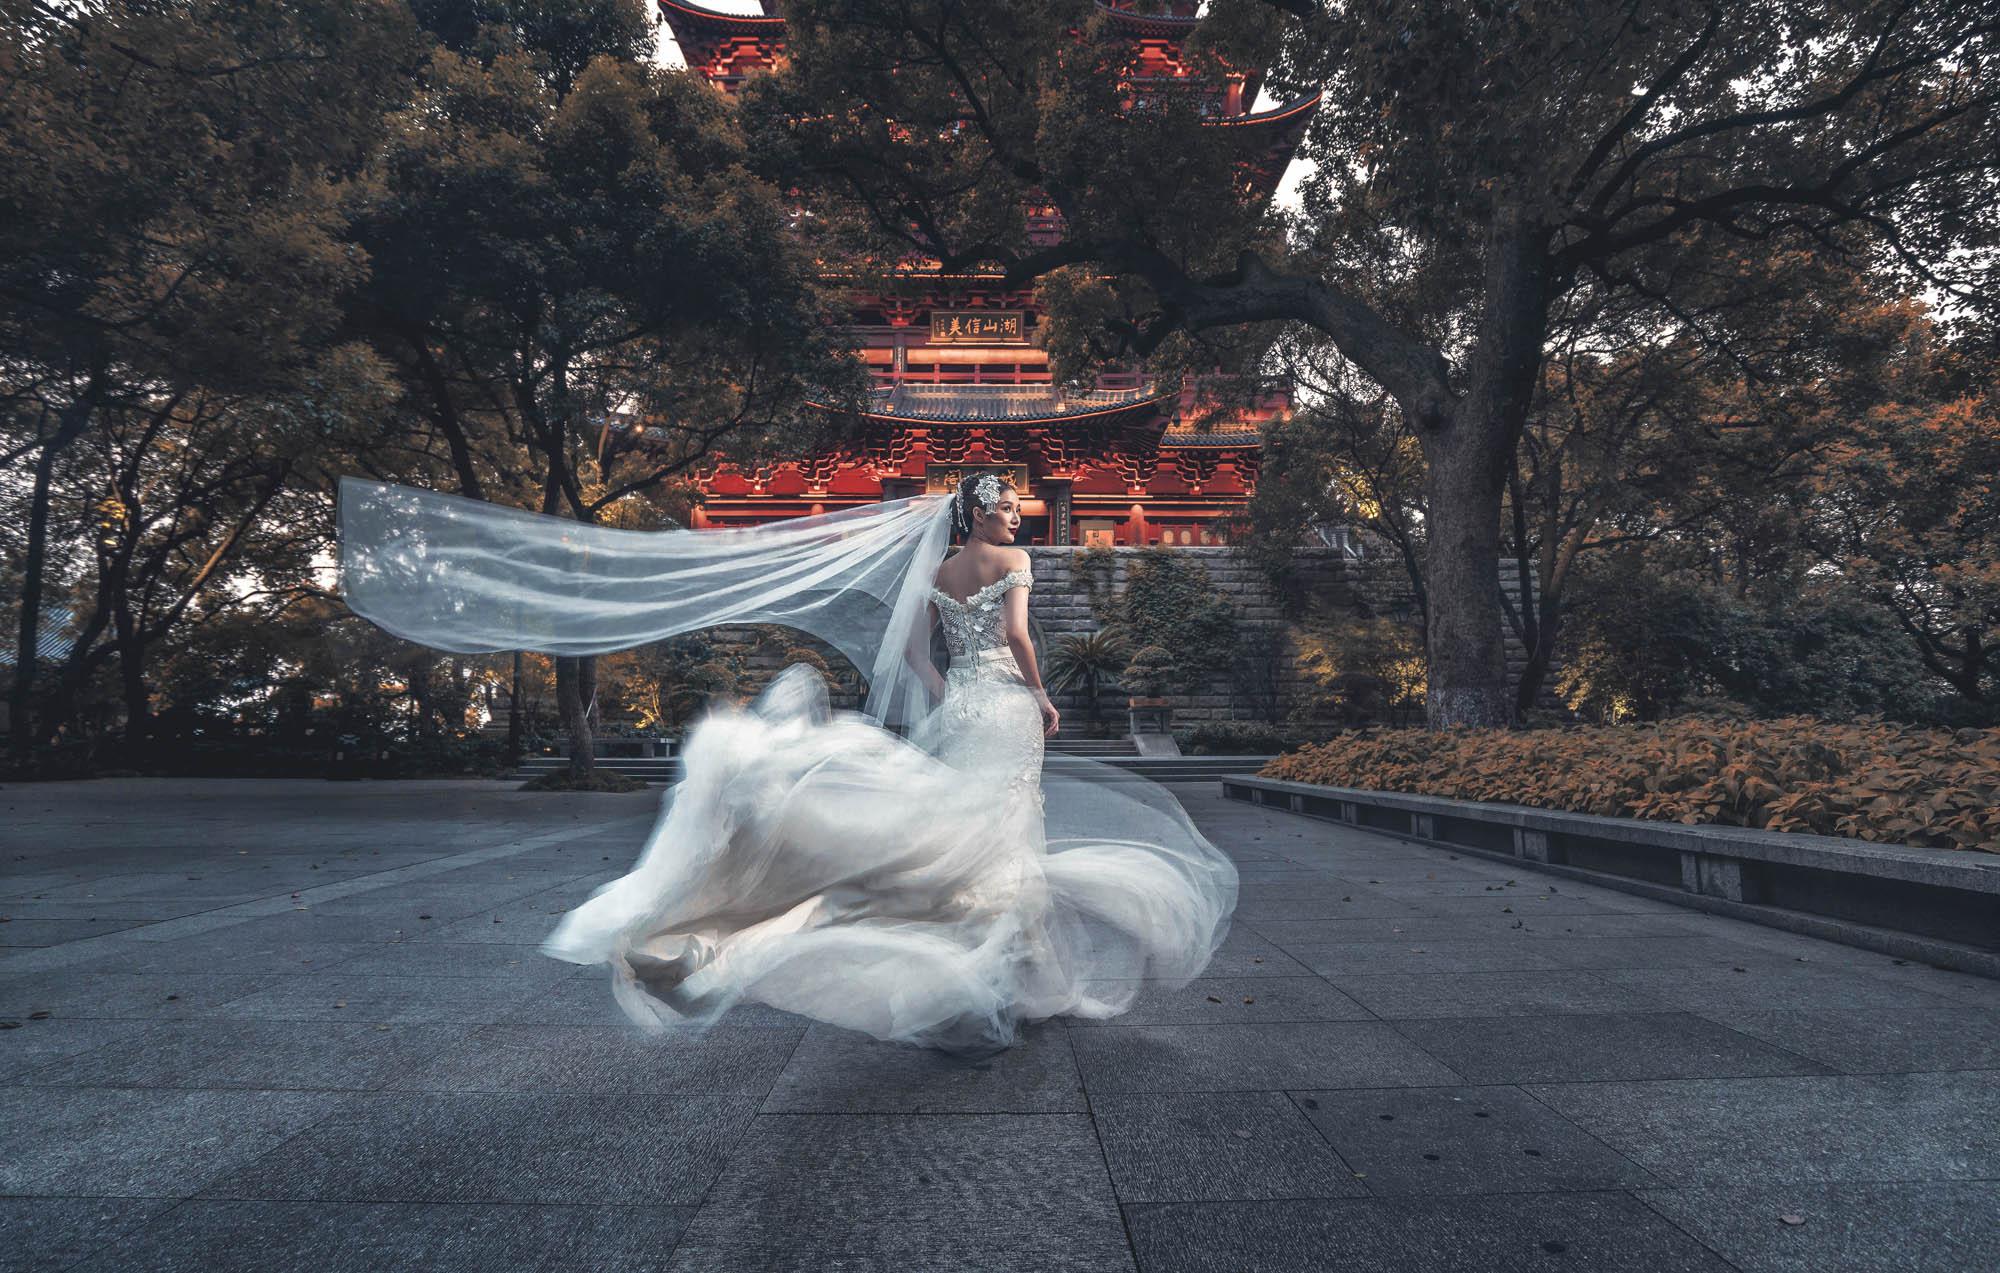 dramatic-bridal-portrait-flowing-veil-against-chinese-pagoda-worlds-best-wedding-photos-cm-leung-china-wedding-photographers